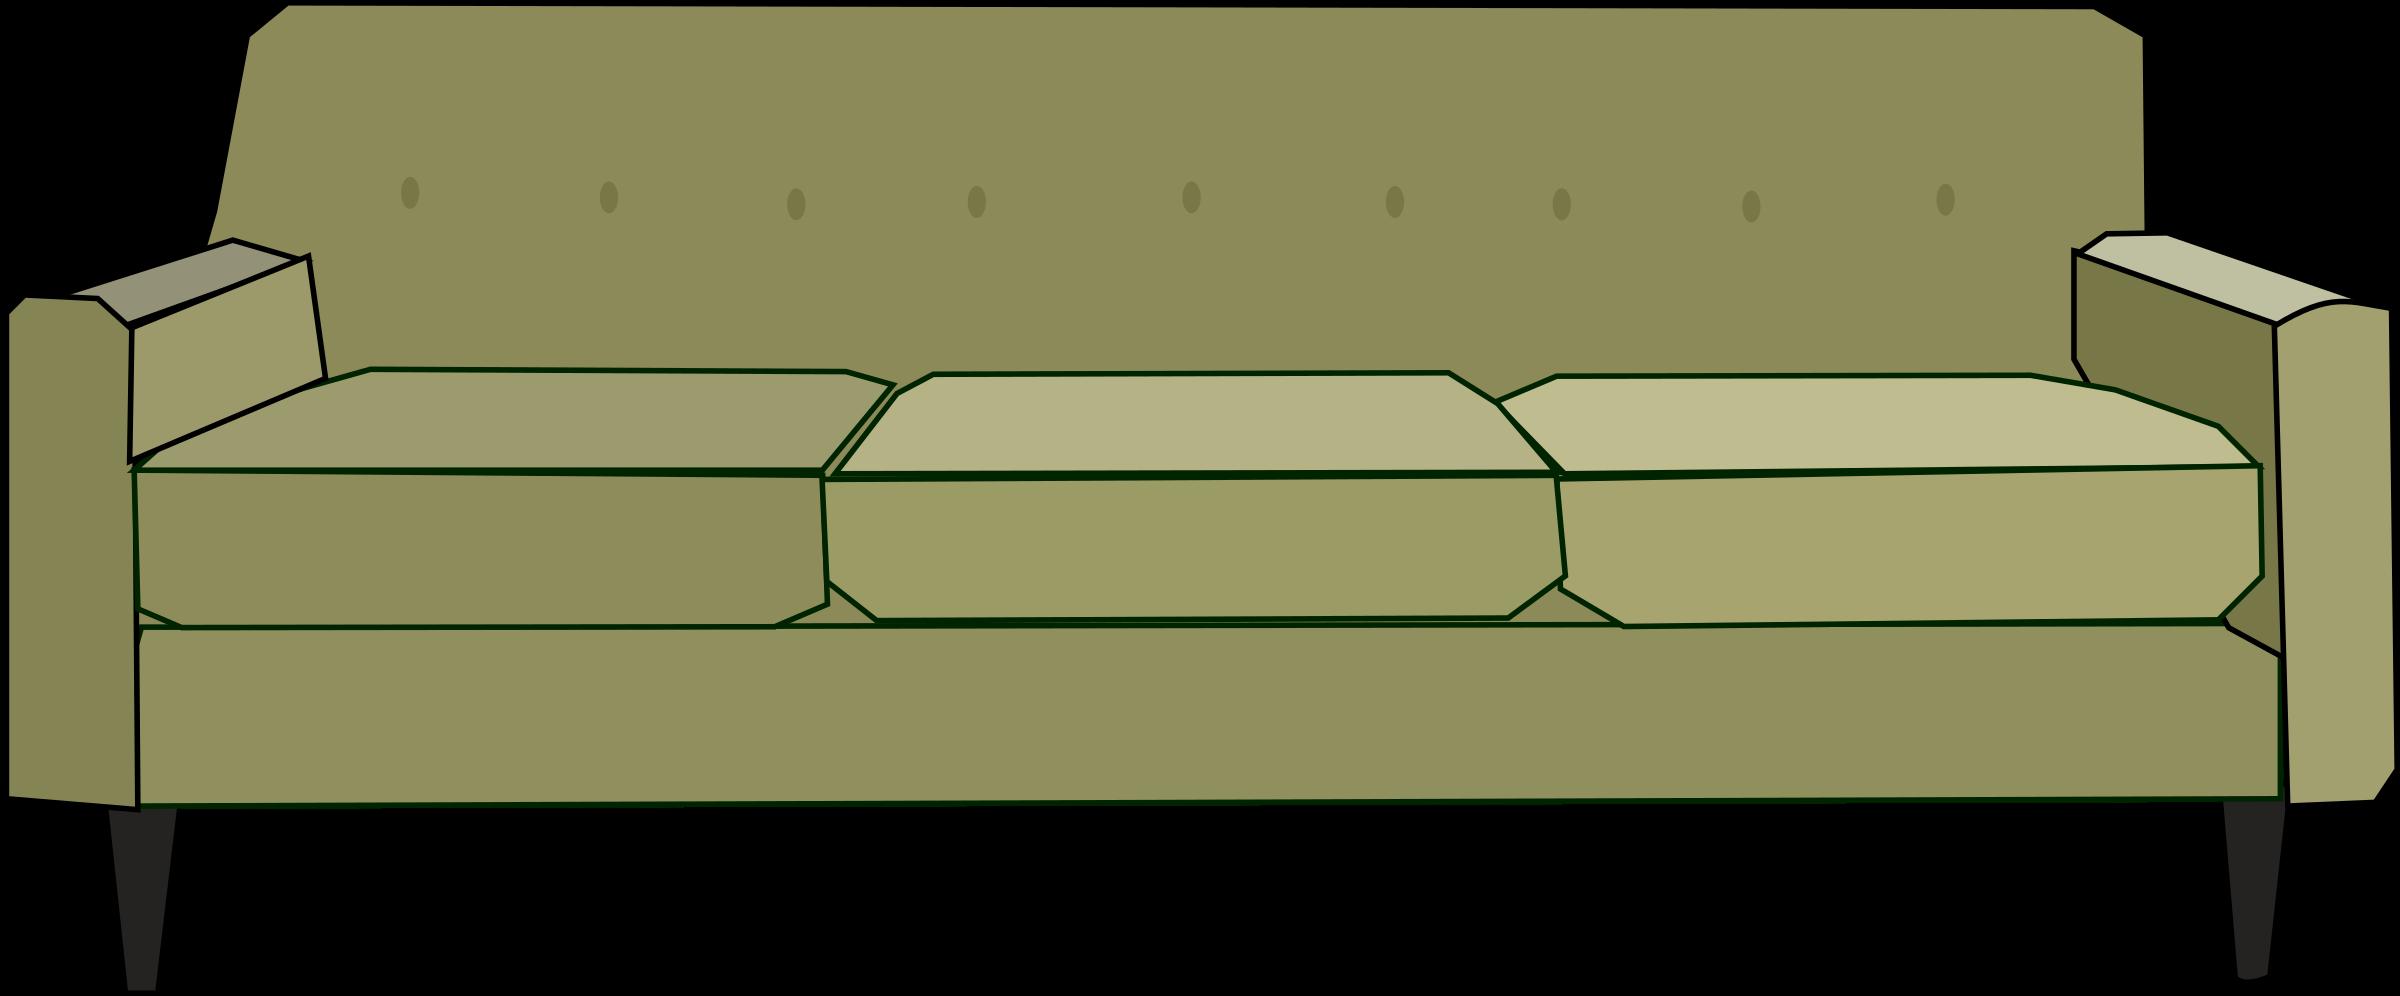 Couch clipart carton. Green sofa big image